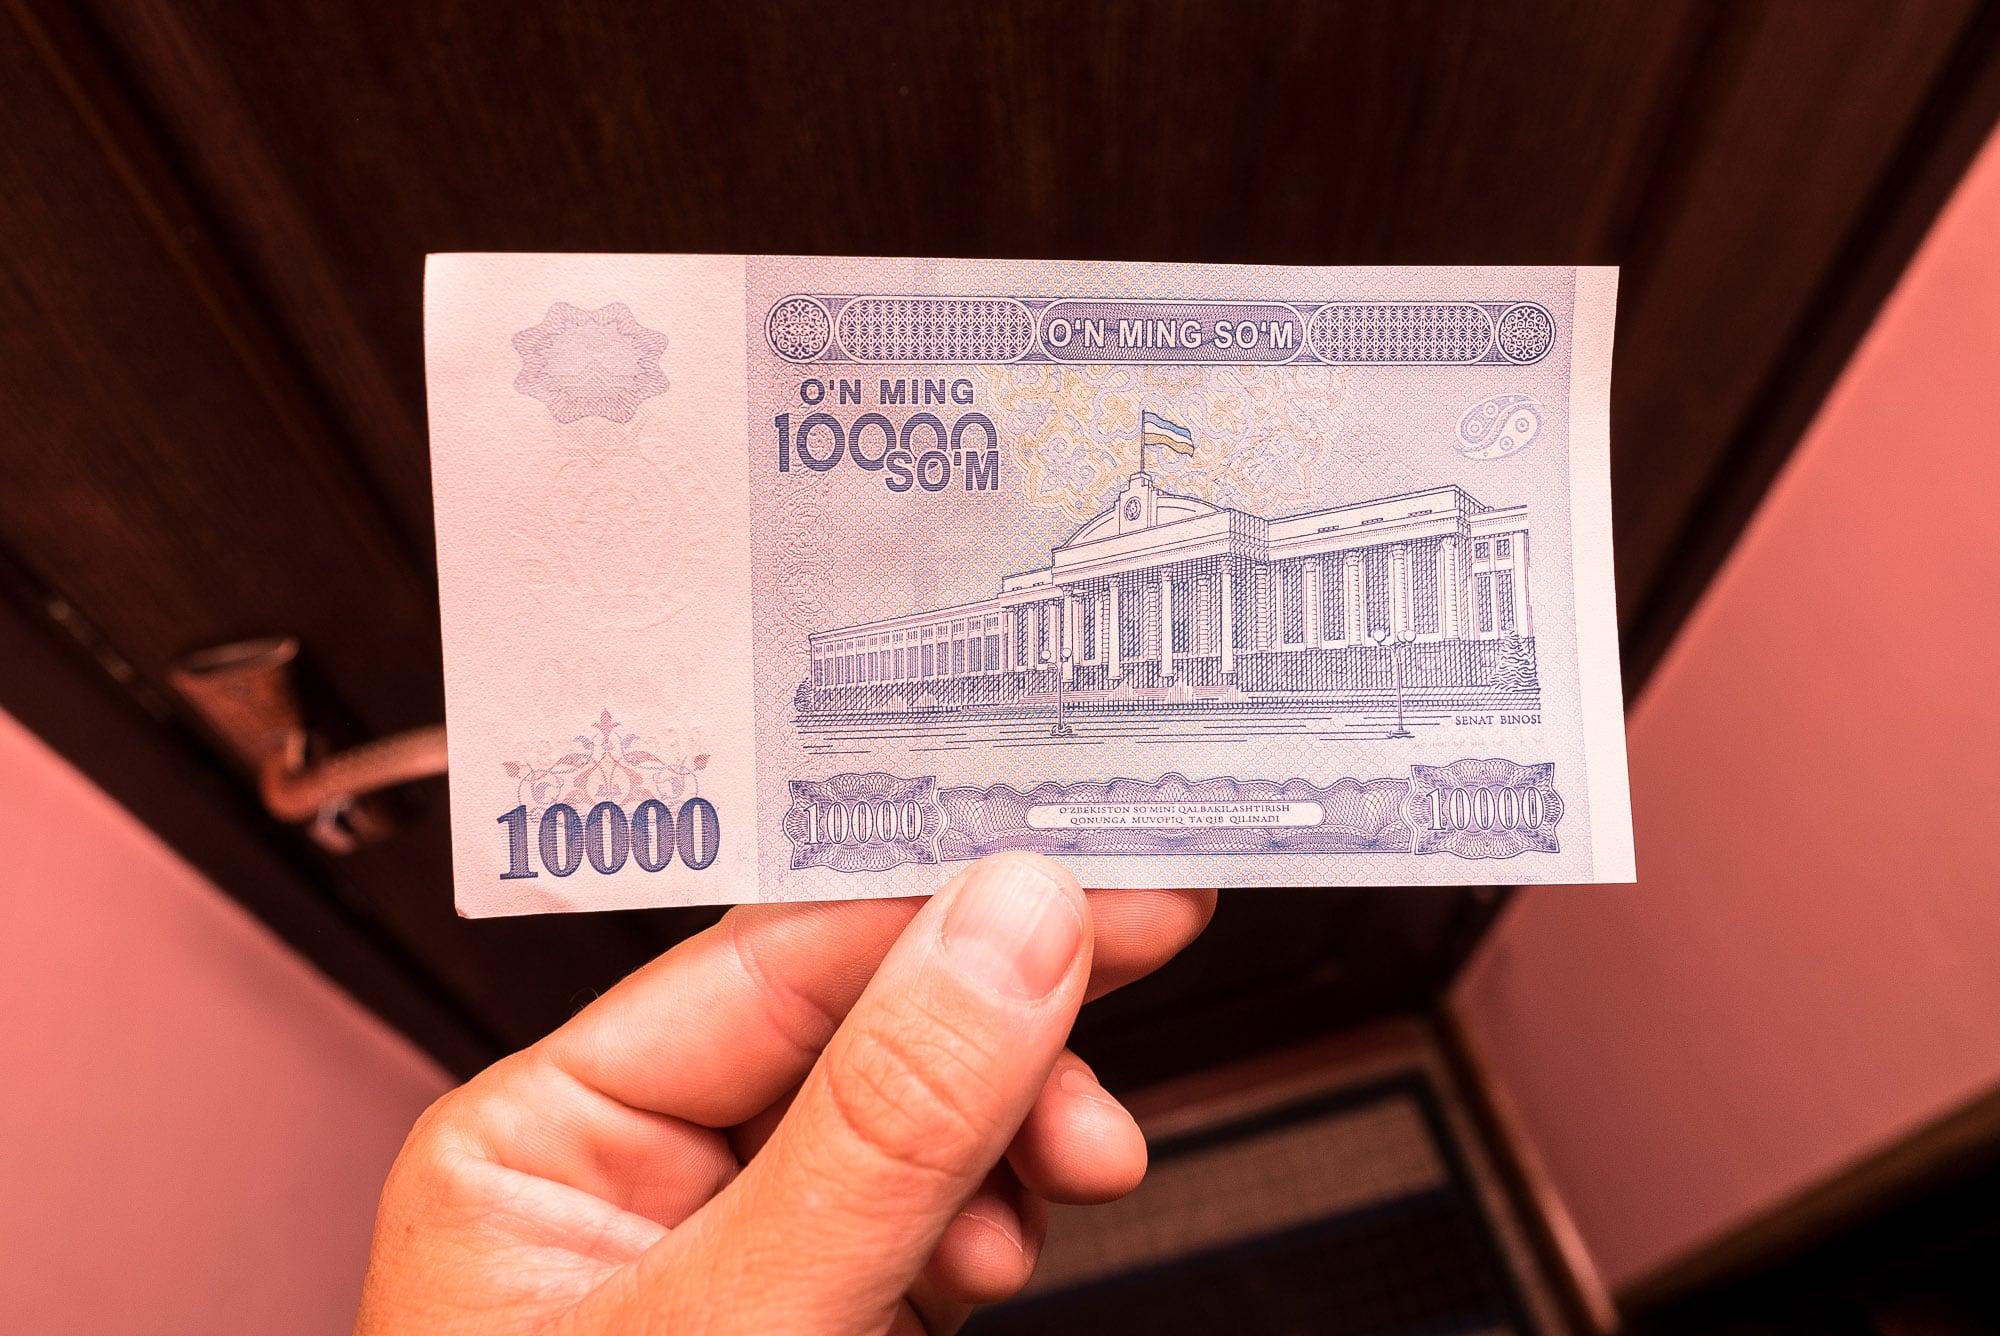 new 10000 som note back